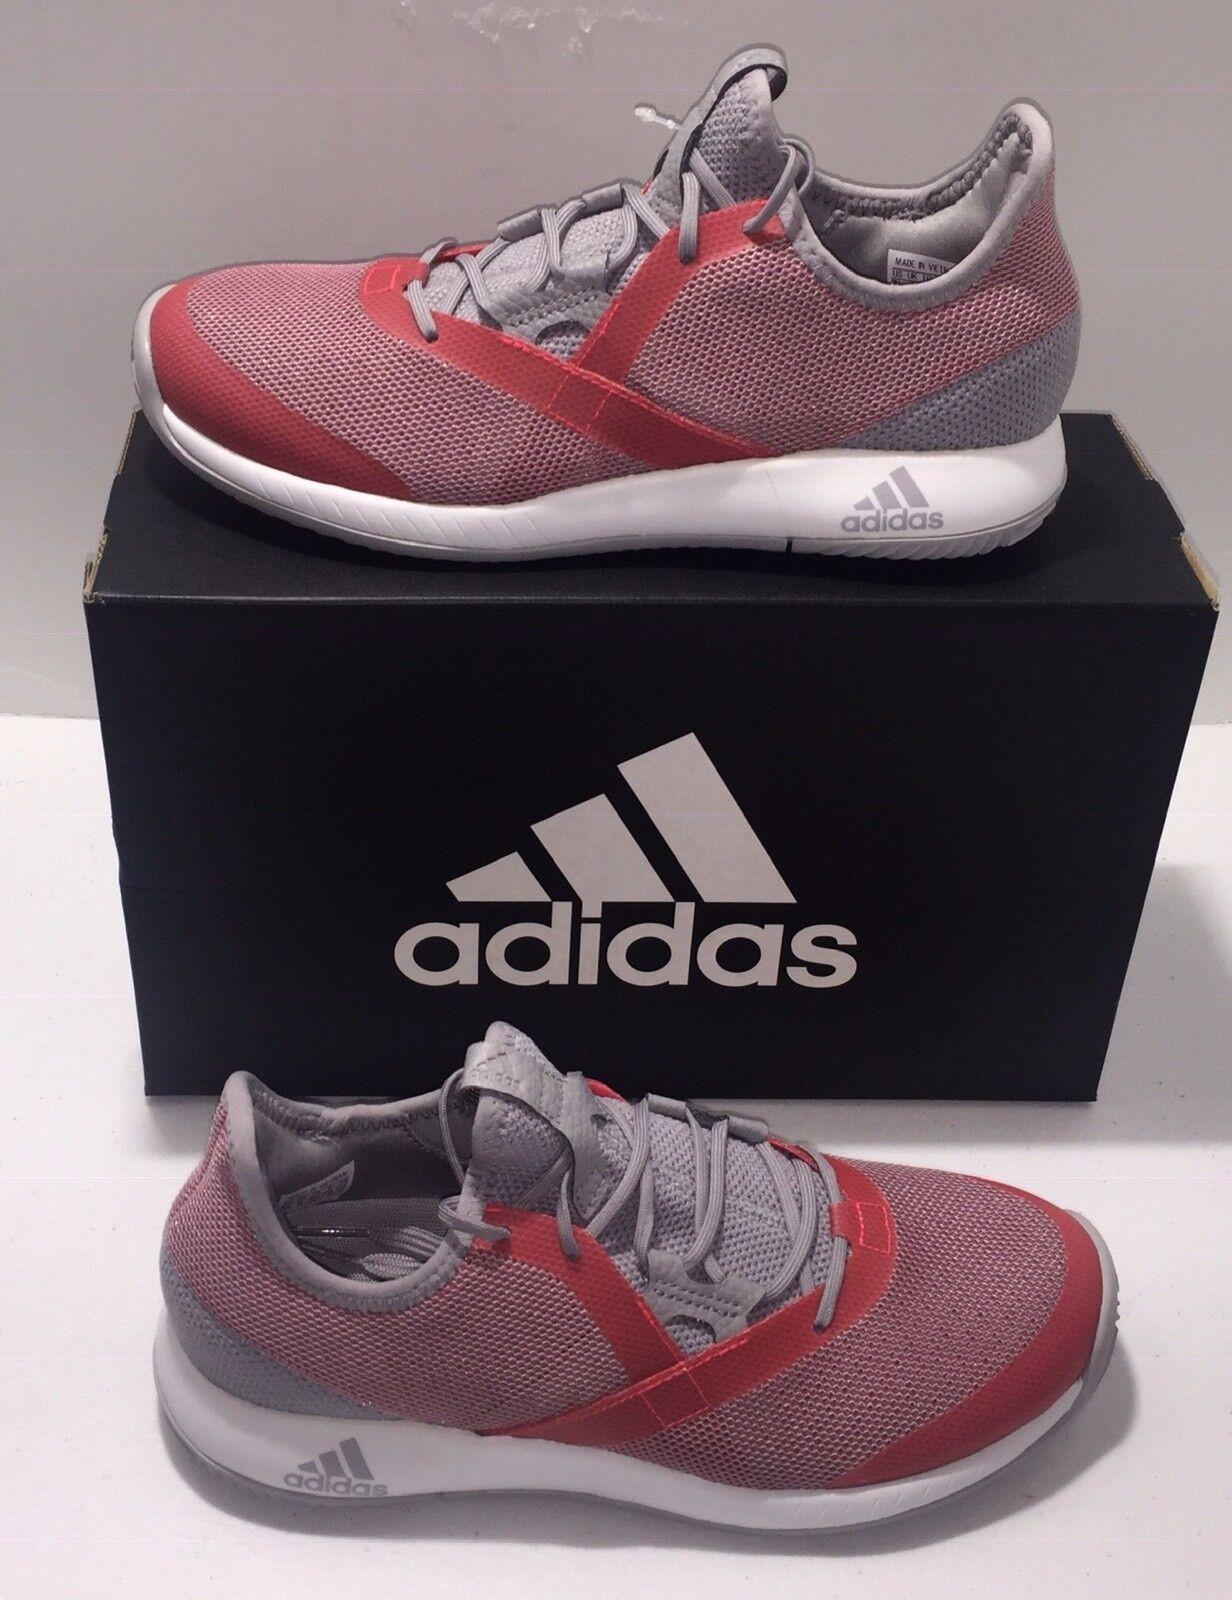 Women's Adidas Adizero Defiant bounce Granite Red Tennis shoes Sz 7